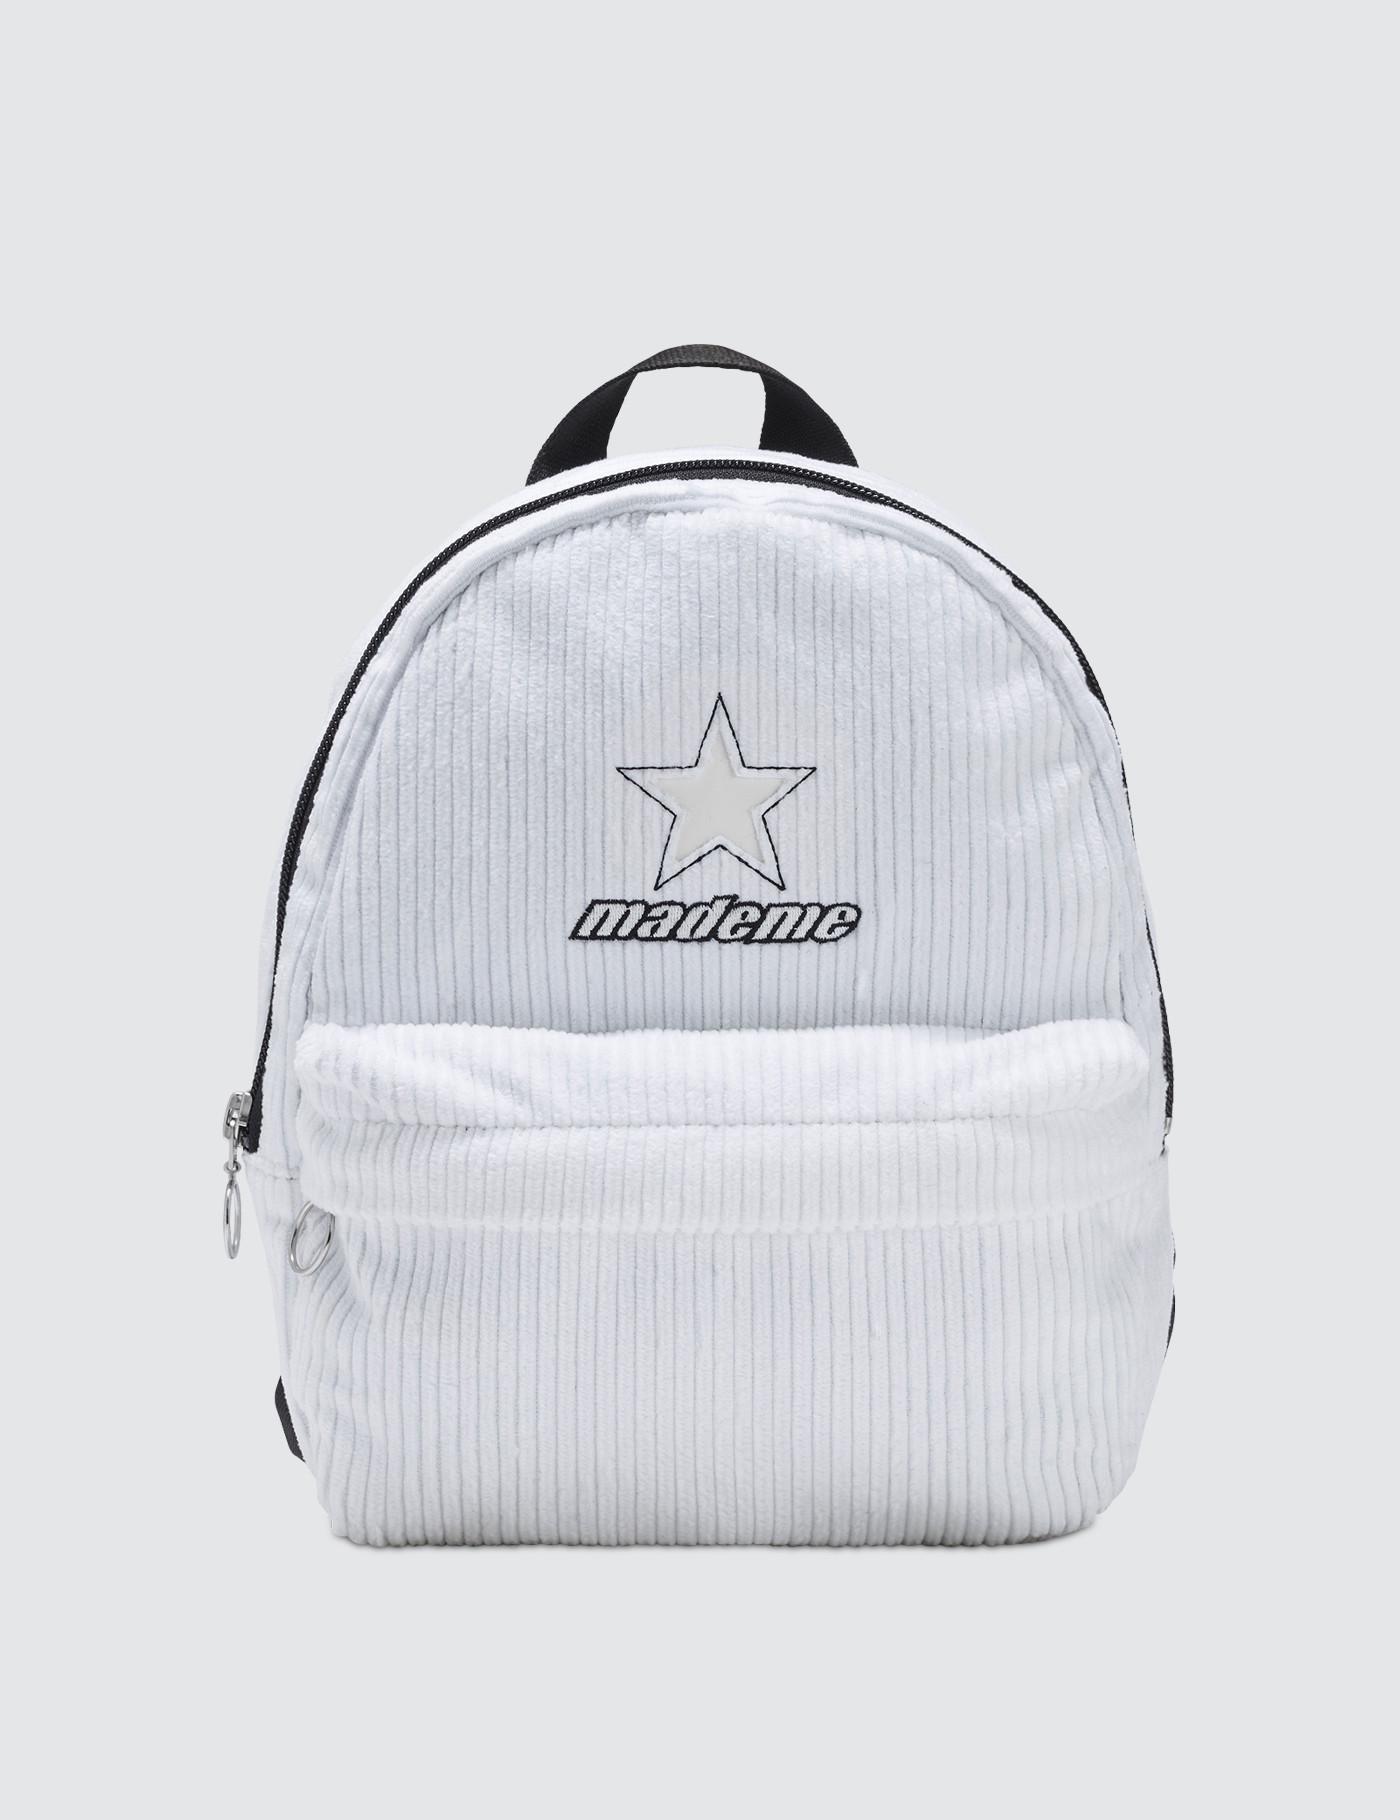 81792f33388 Converse Mademe X Super Mini Backpack in White - Lyst